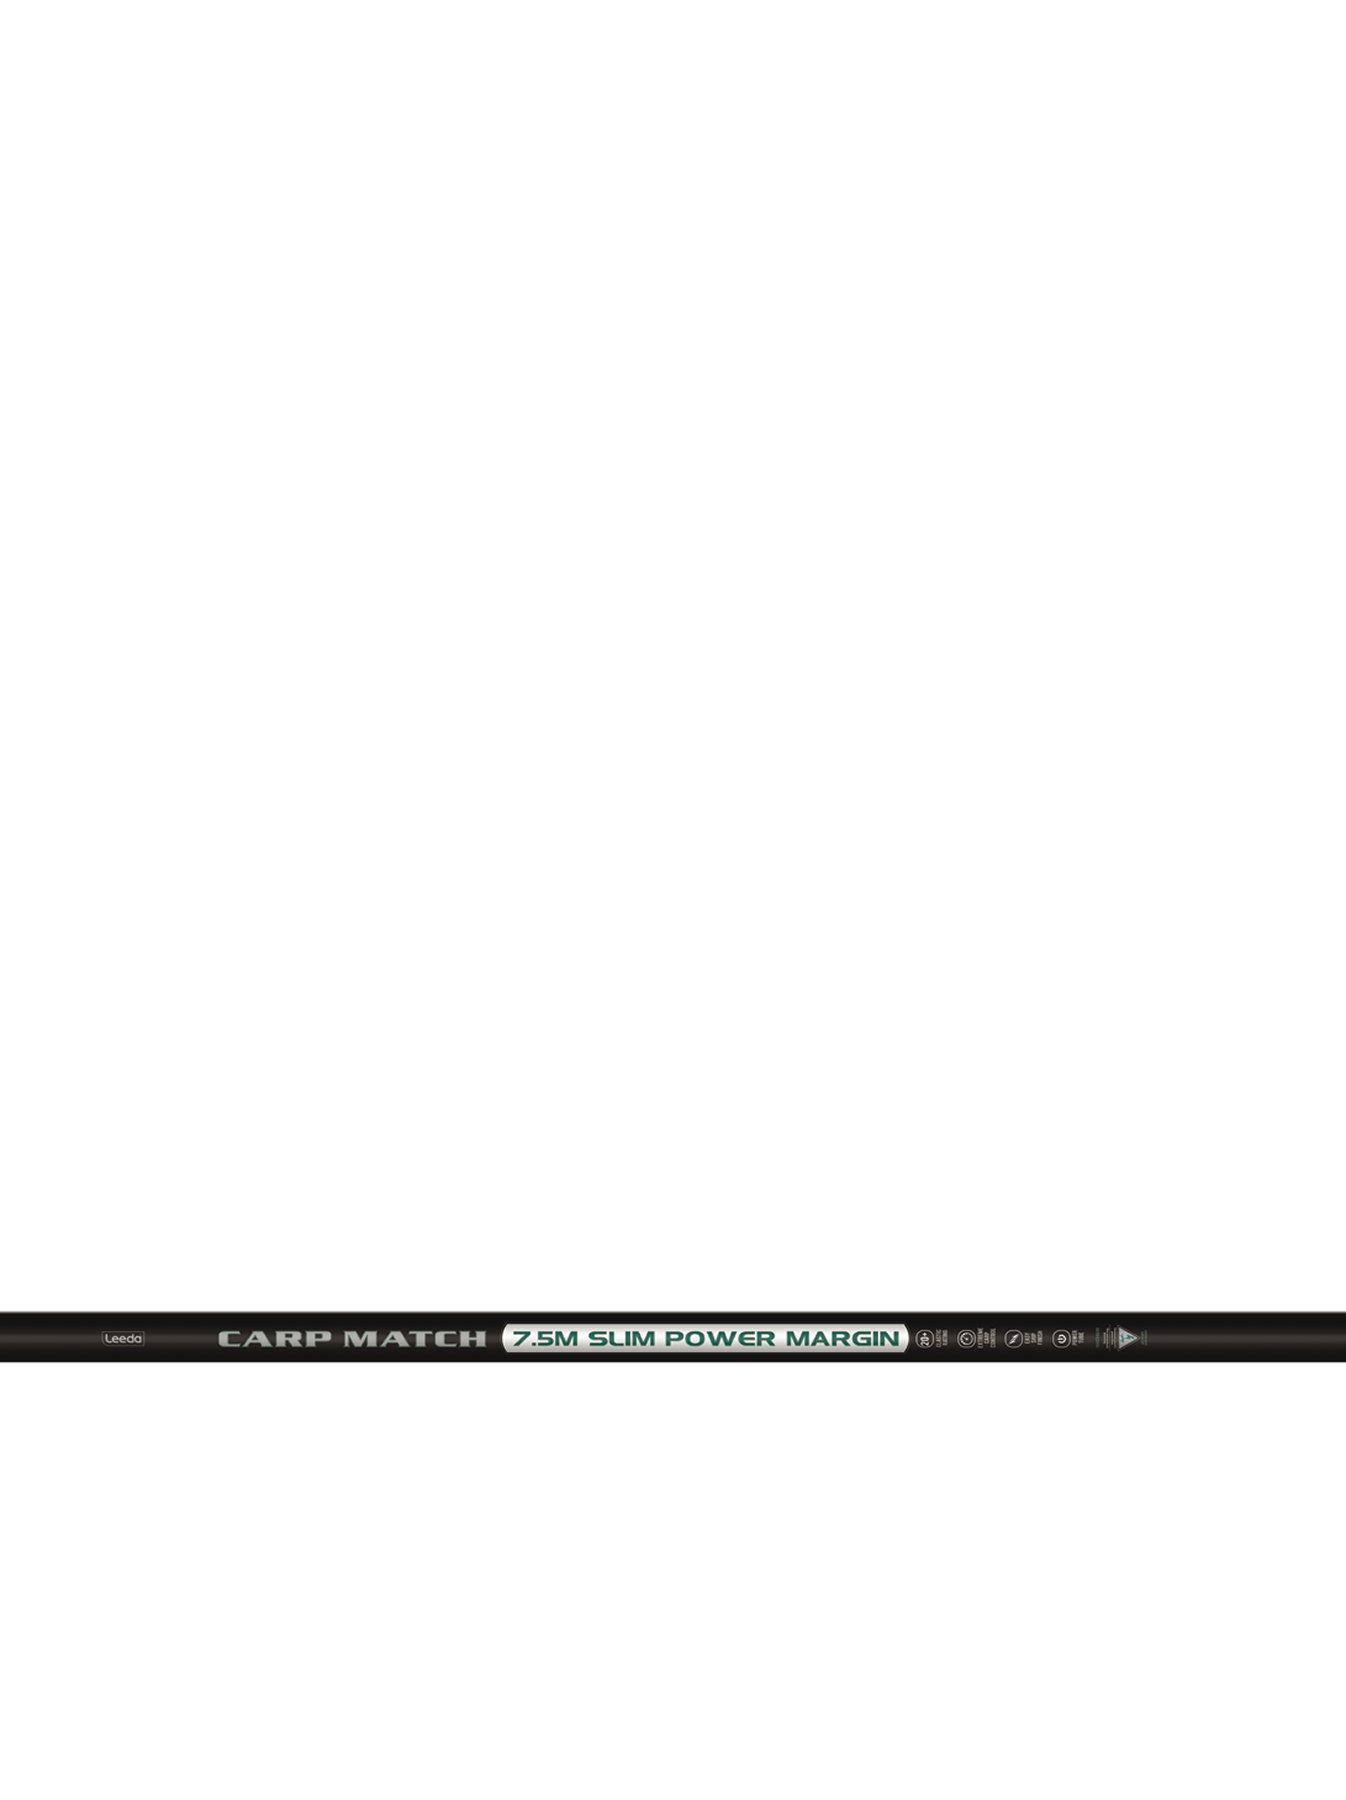 Carp Match Slim 7.5m Power Margin Pole